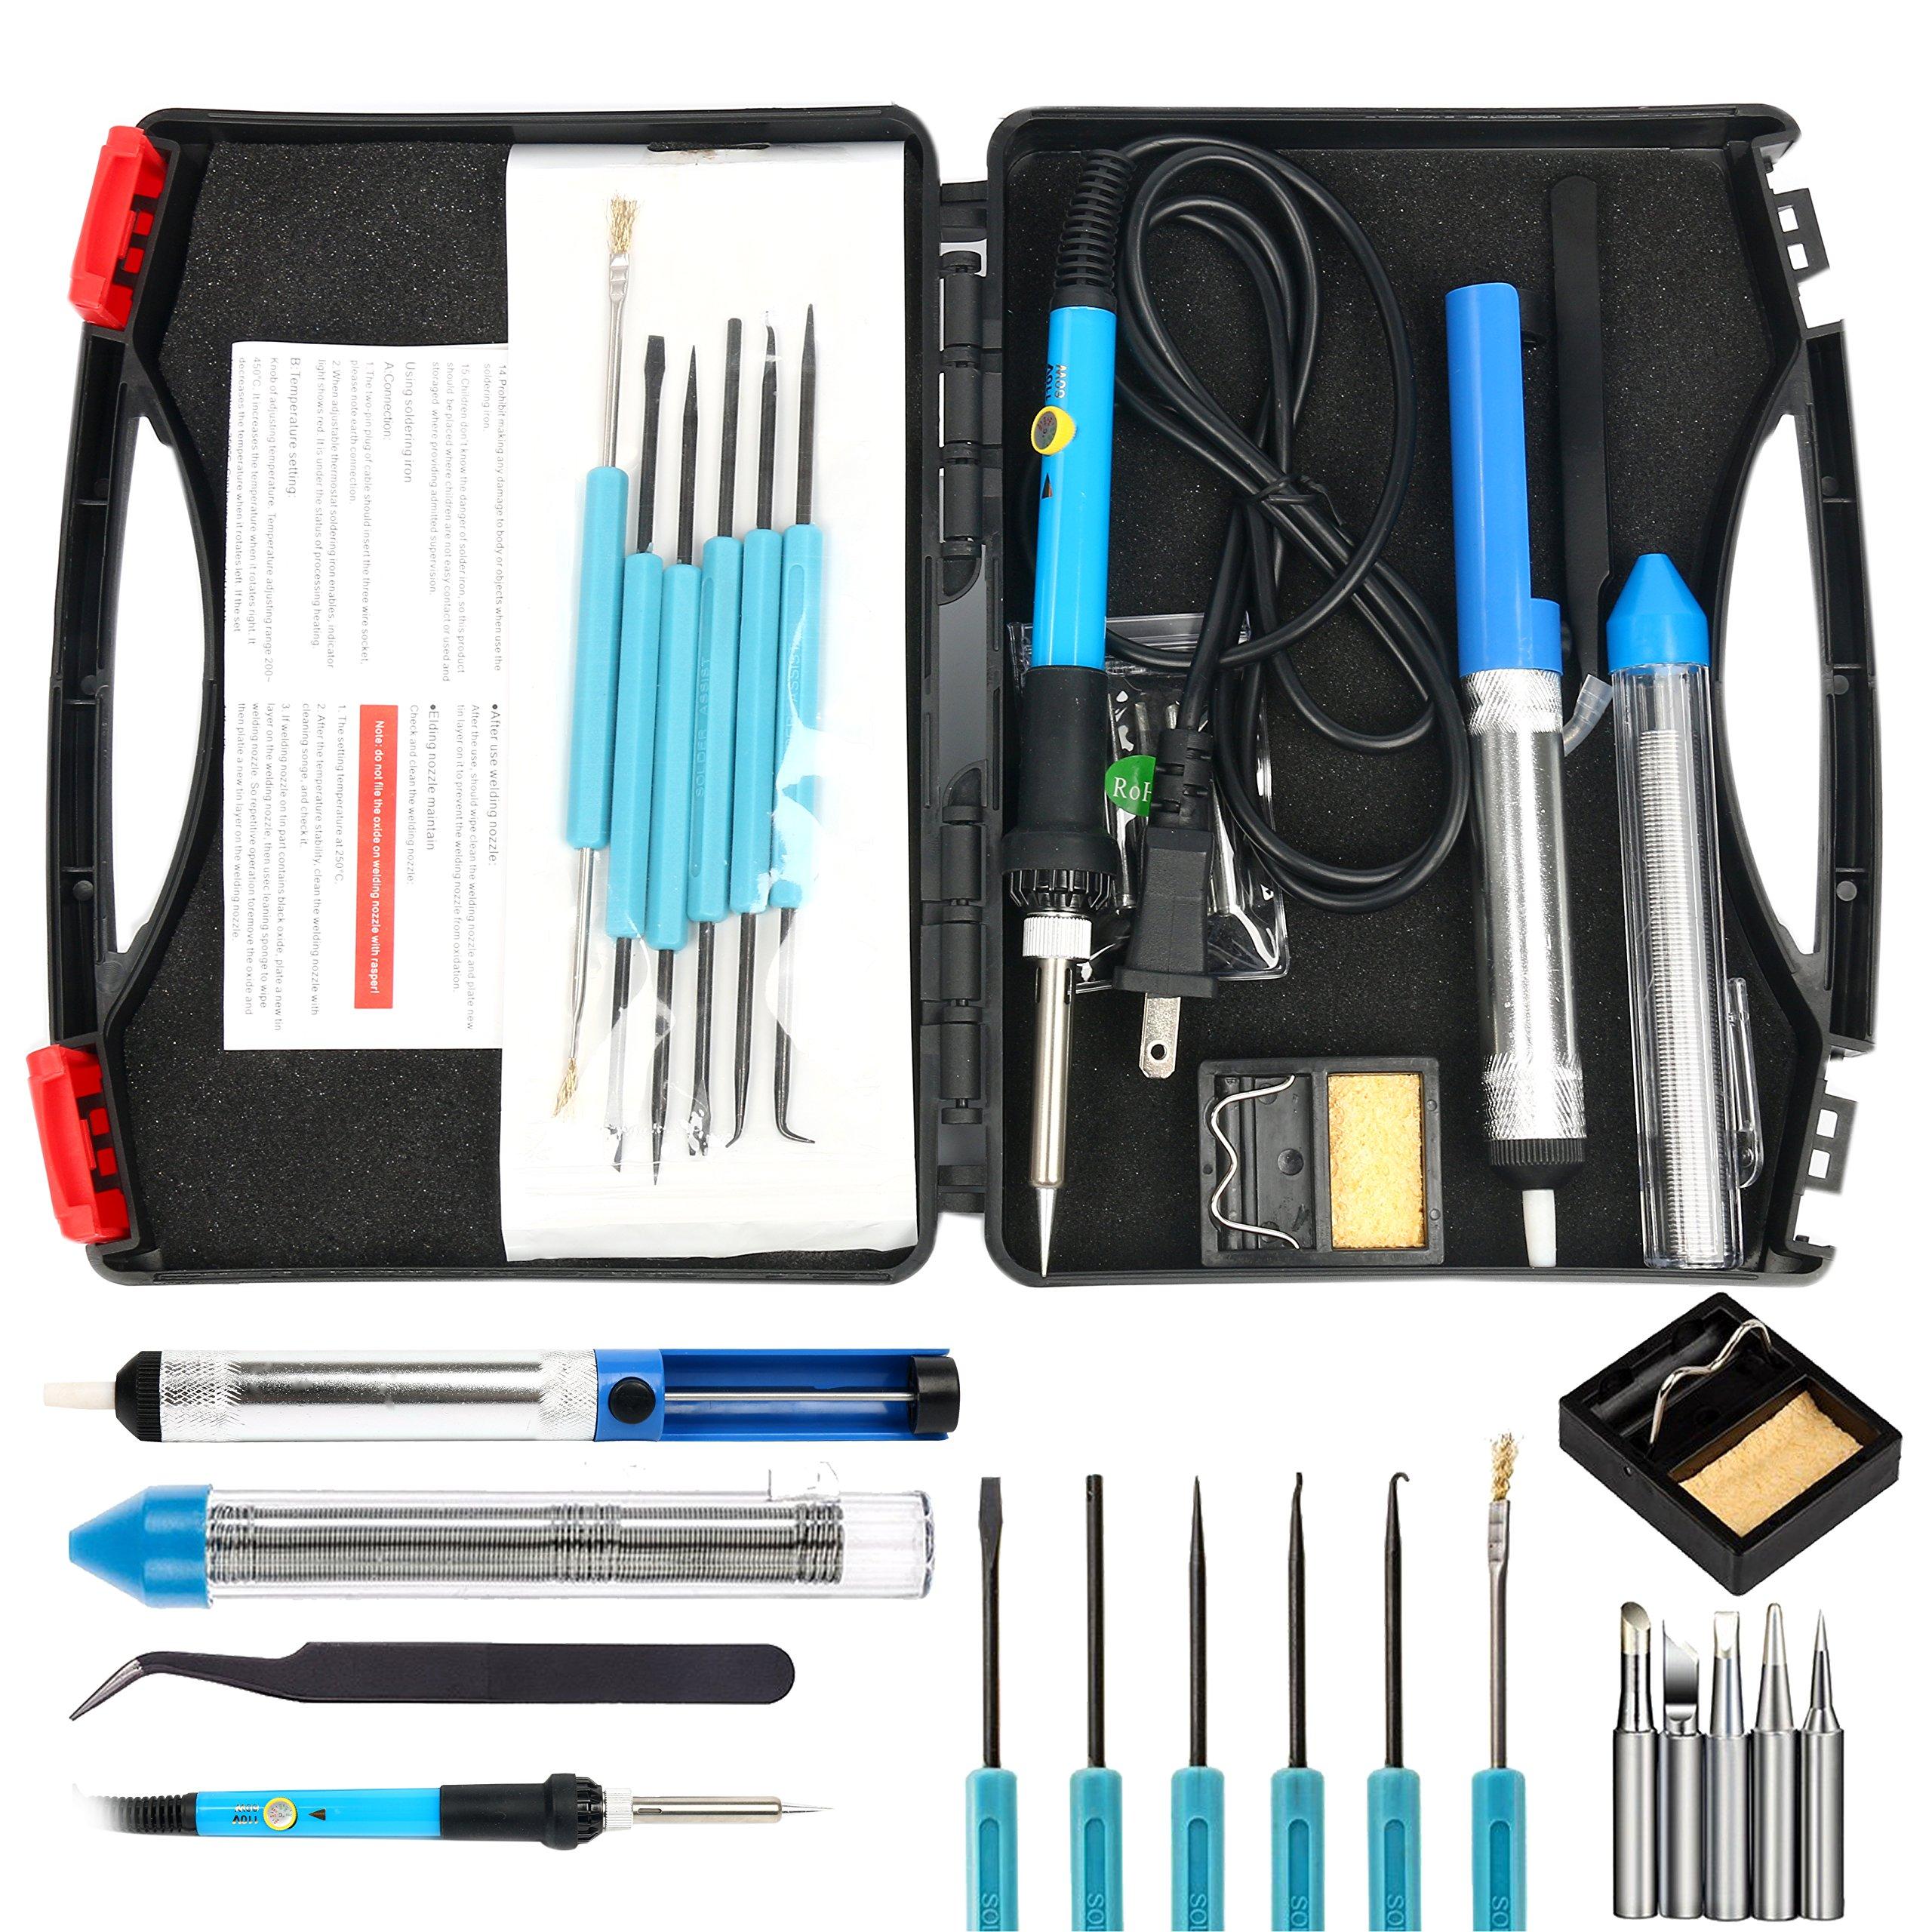 YaeTek 17in1 60W 110V Adjustable Temperature Welding Soldering Iron Kit with Soldering Gun Pen, Desoldering Pump, 5pcs Tips, Stand, Anti-static Tweezers, Additional Solder Tube, Carry Case